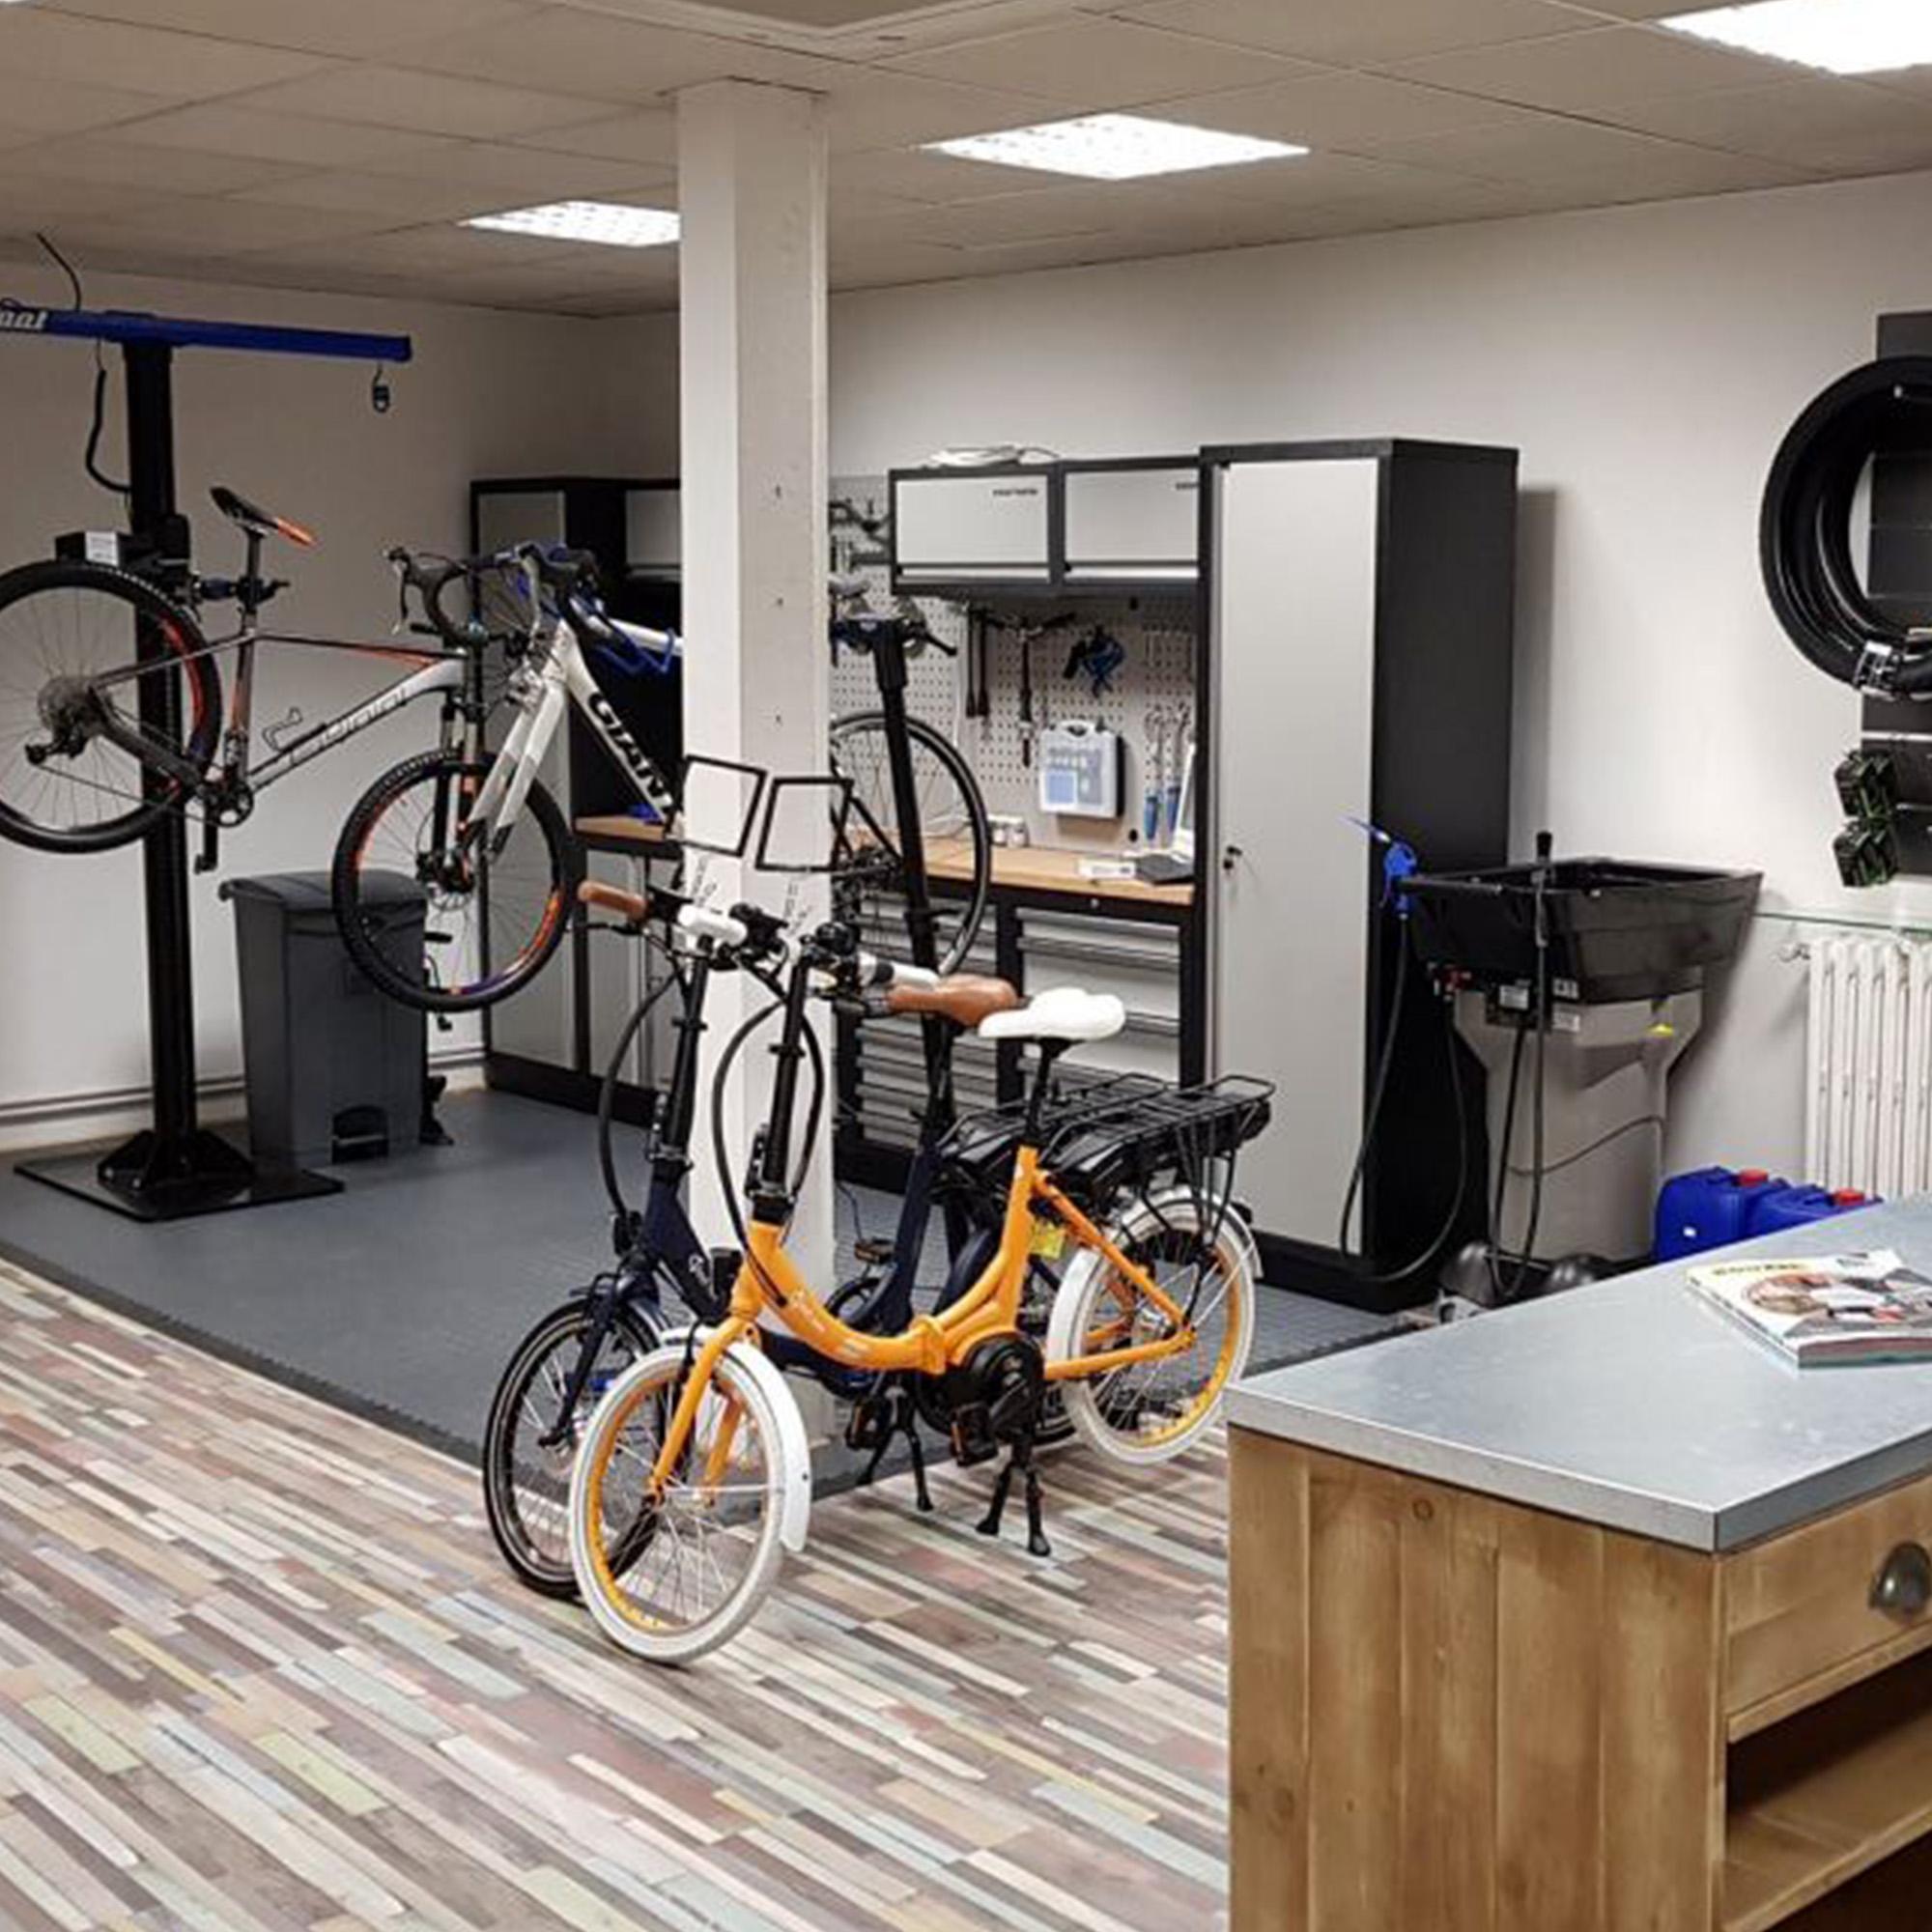 gîte_saint_germain_oise_versigny_0026_B-n-Bicyclette-L-Atelier-de-Bruno_image_paragraphe